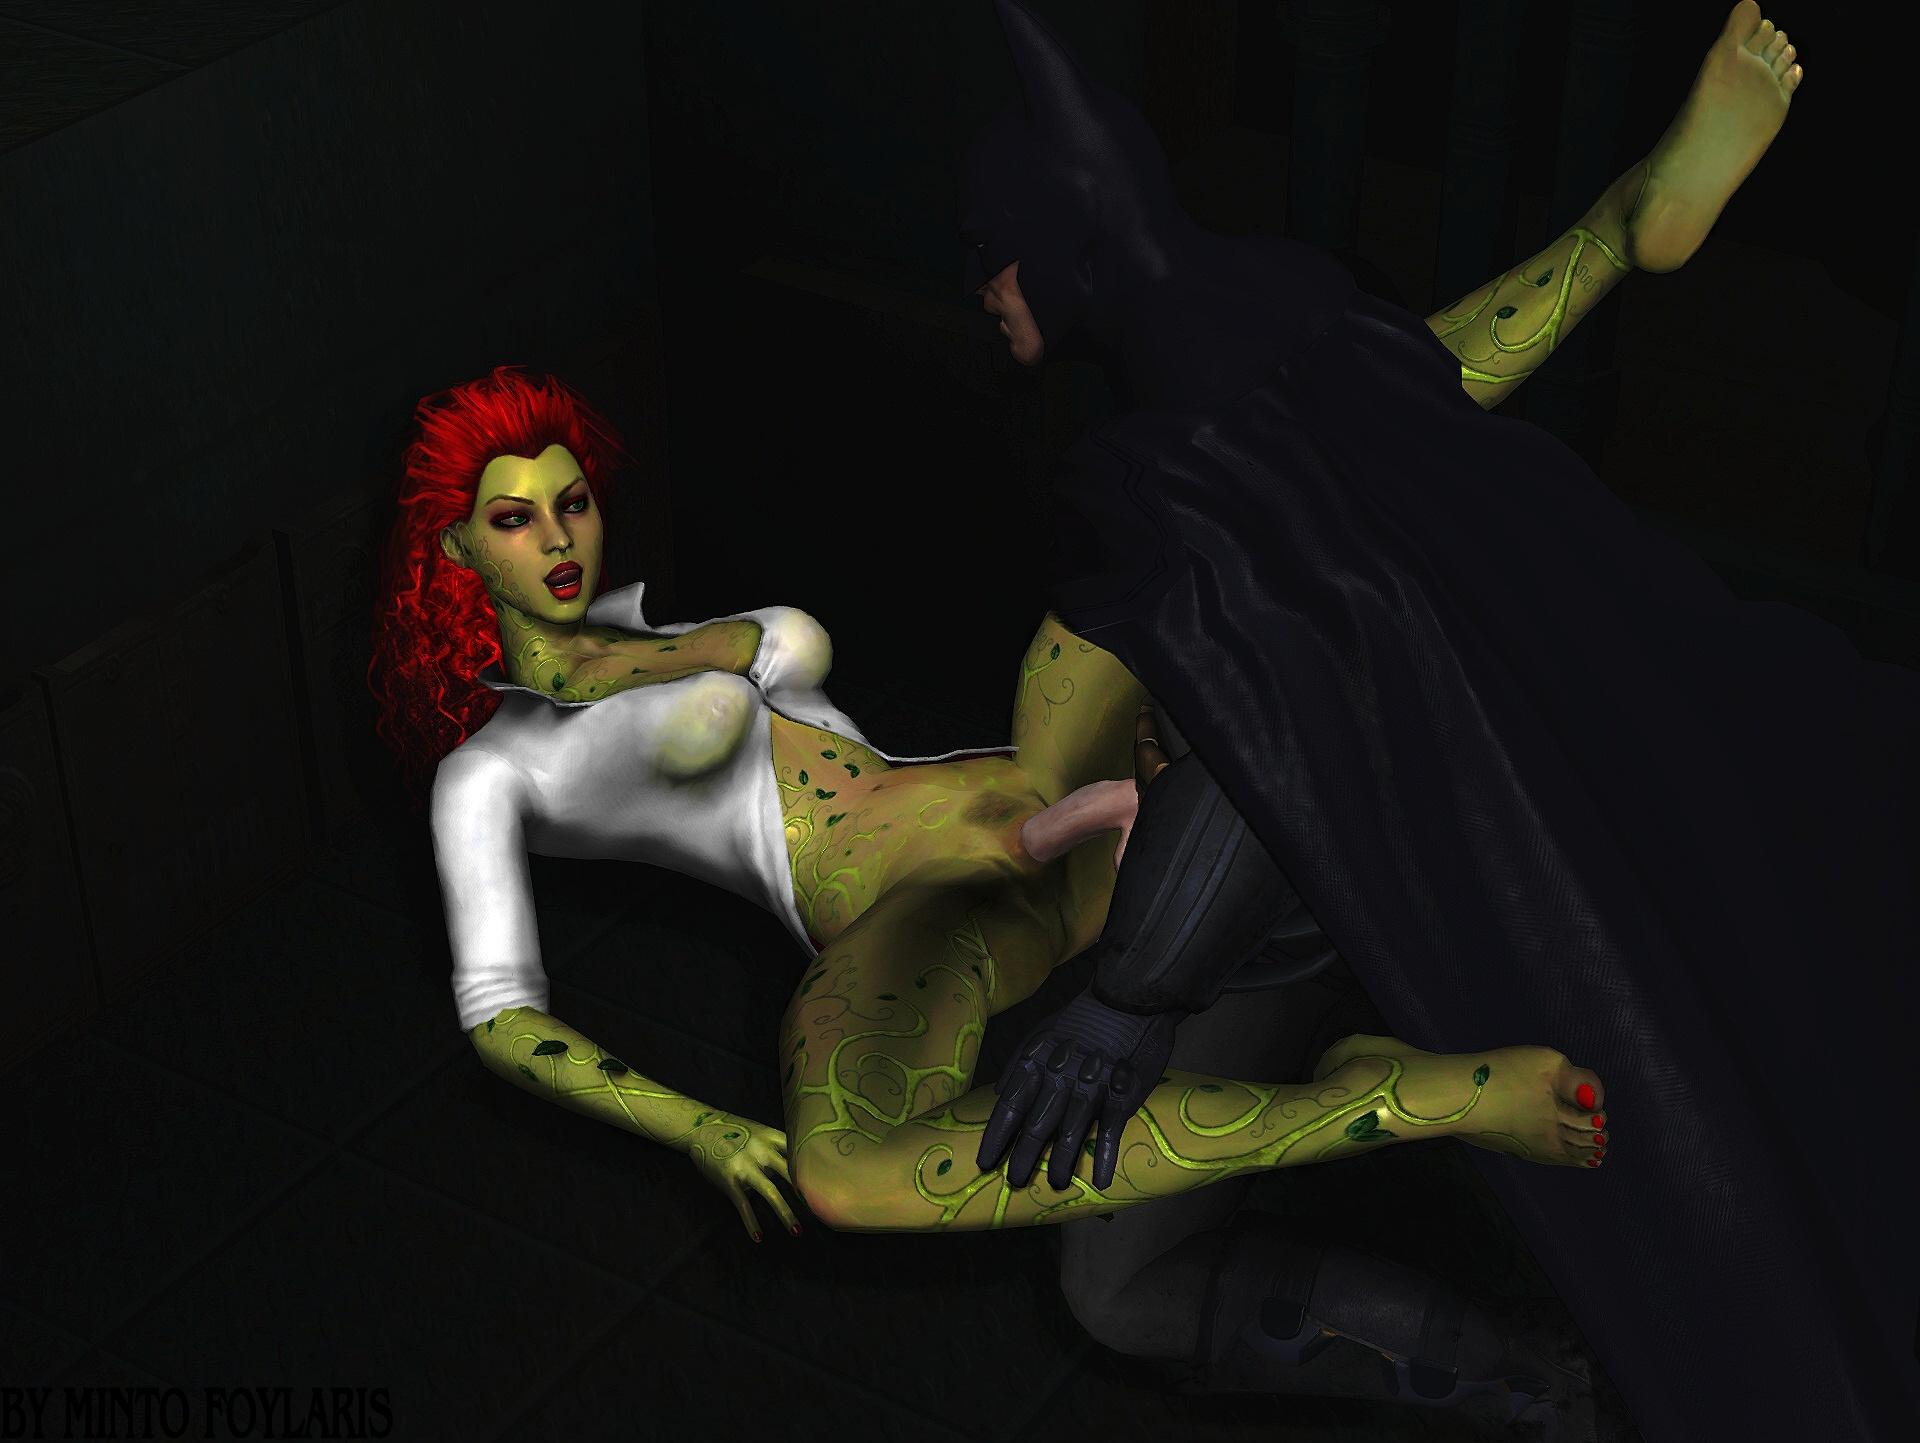 Batman Arkham City Catwoman Nude Mod Install Using Textmod Naked Photo